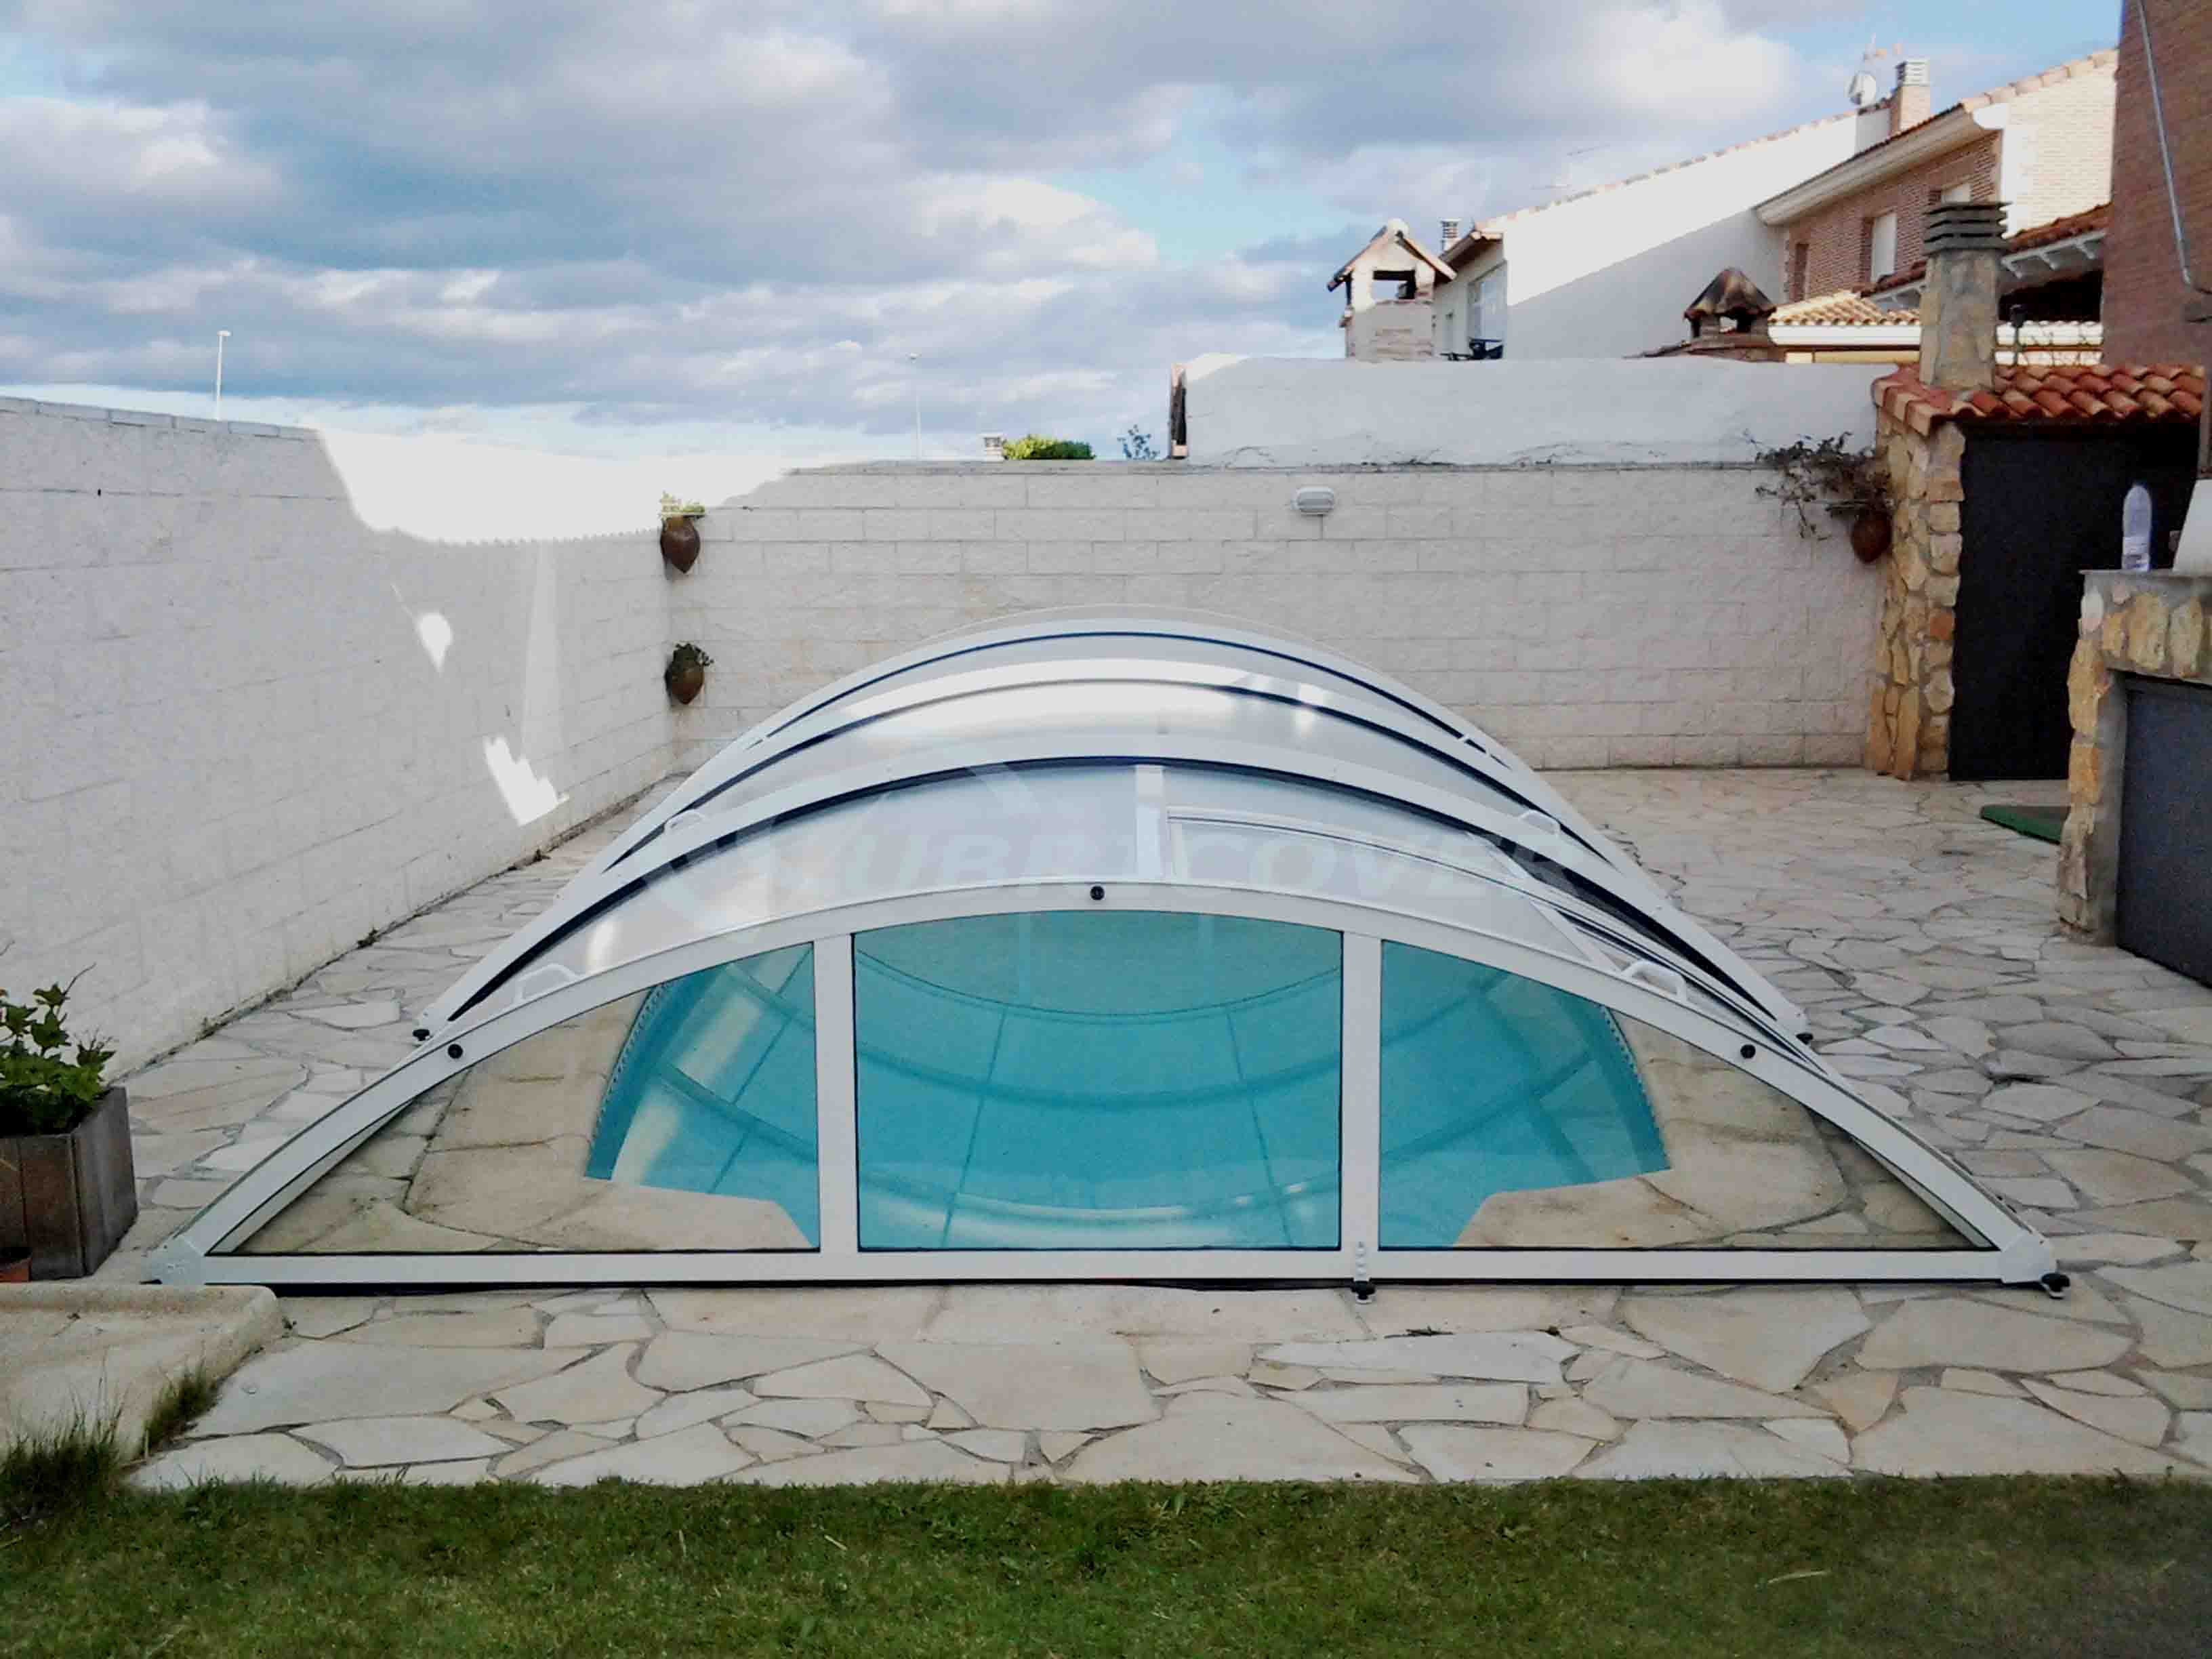 Cubierta para piscina baja telesc pica cubricover for Piscinas benavente